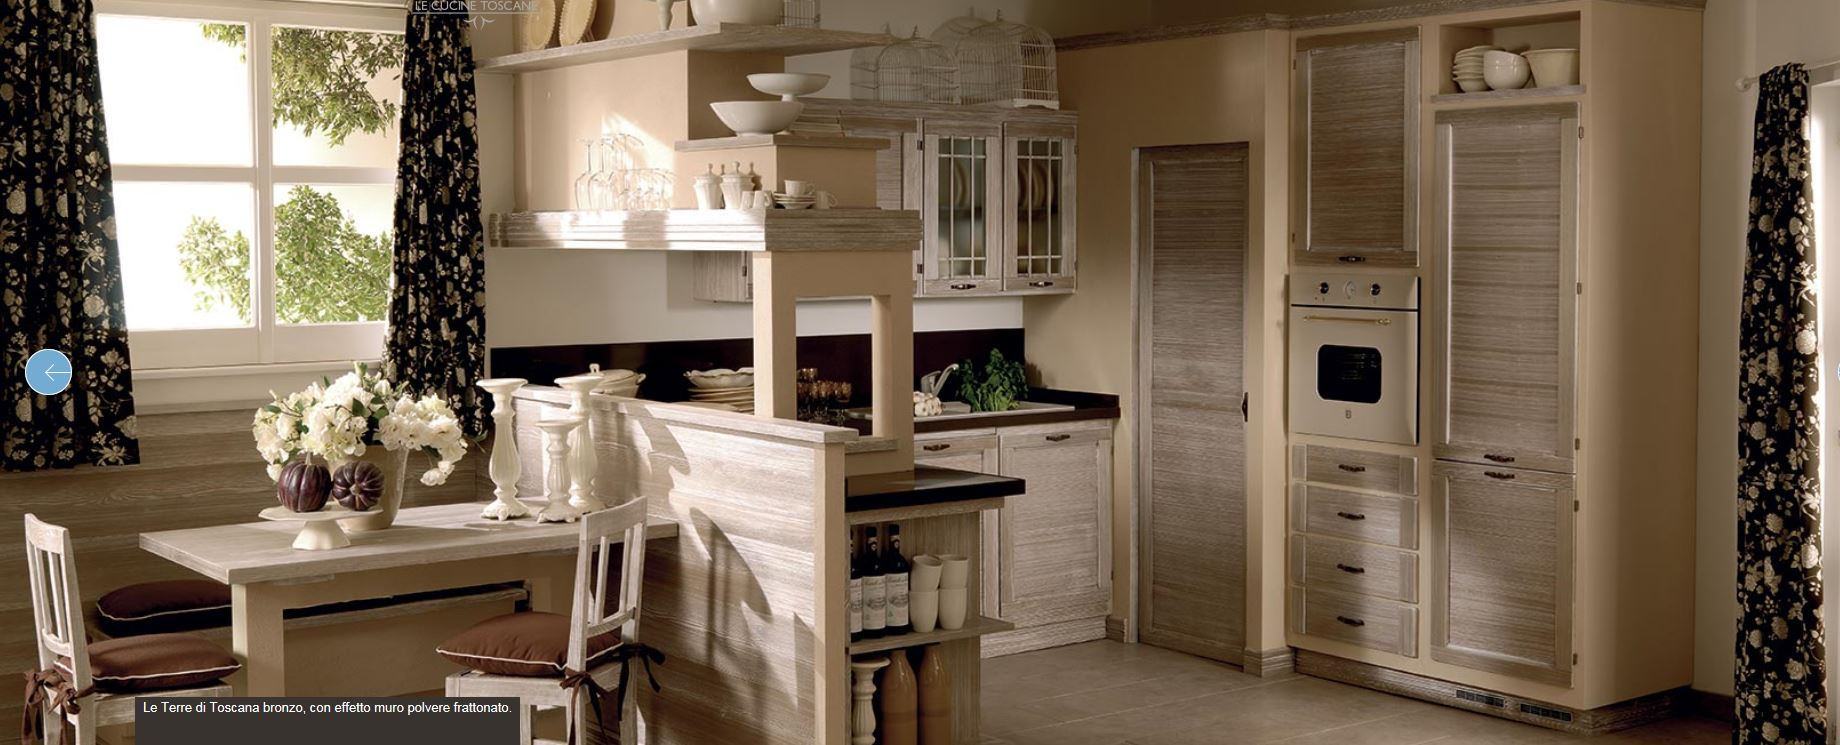 Cucine in muratura - Vibo Valentia - SCARCIA ARREDAMENTI